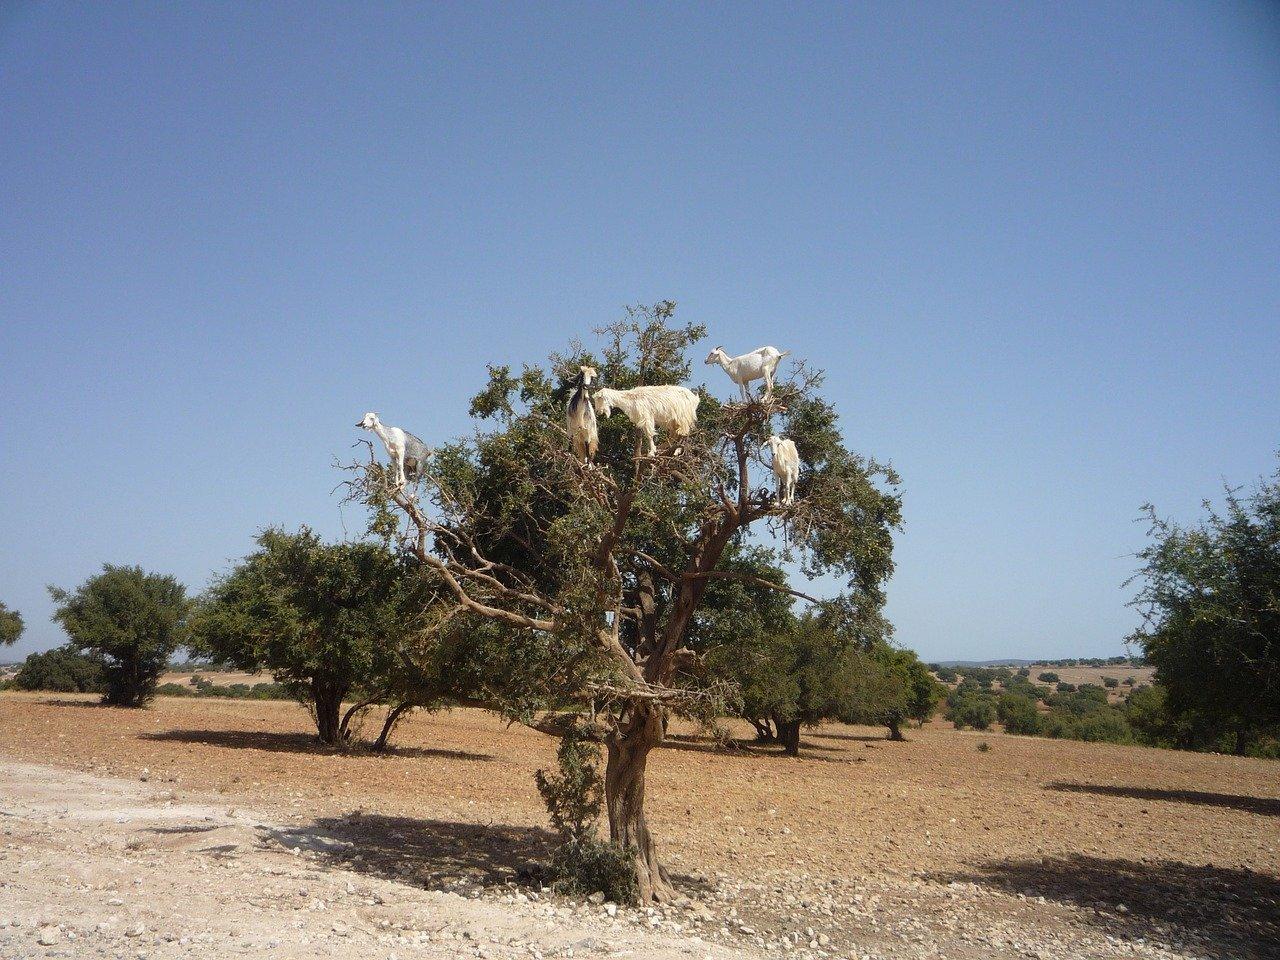 árbol argán con cabras